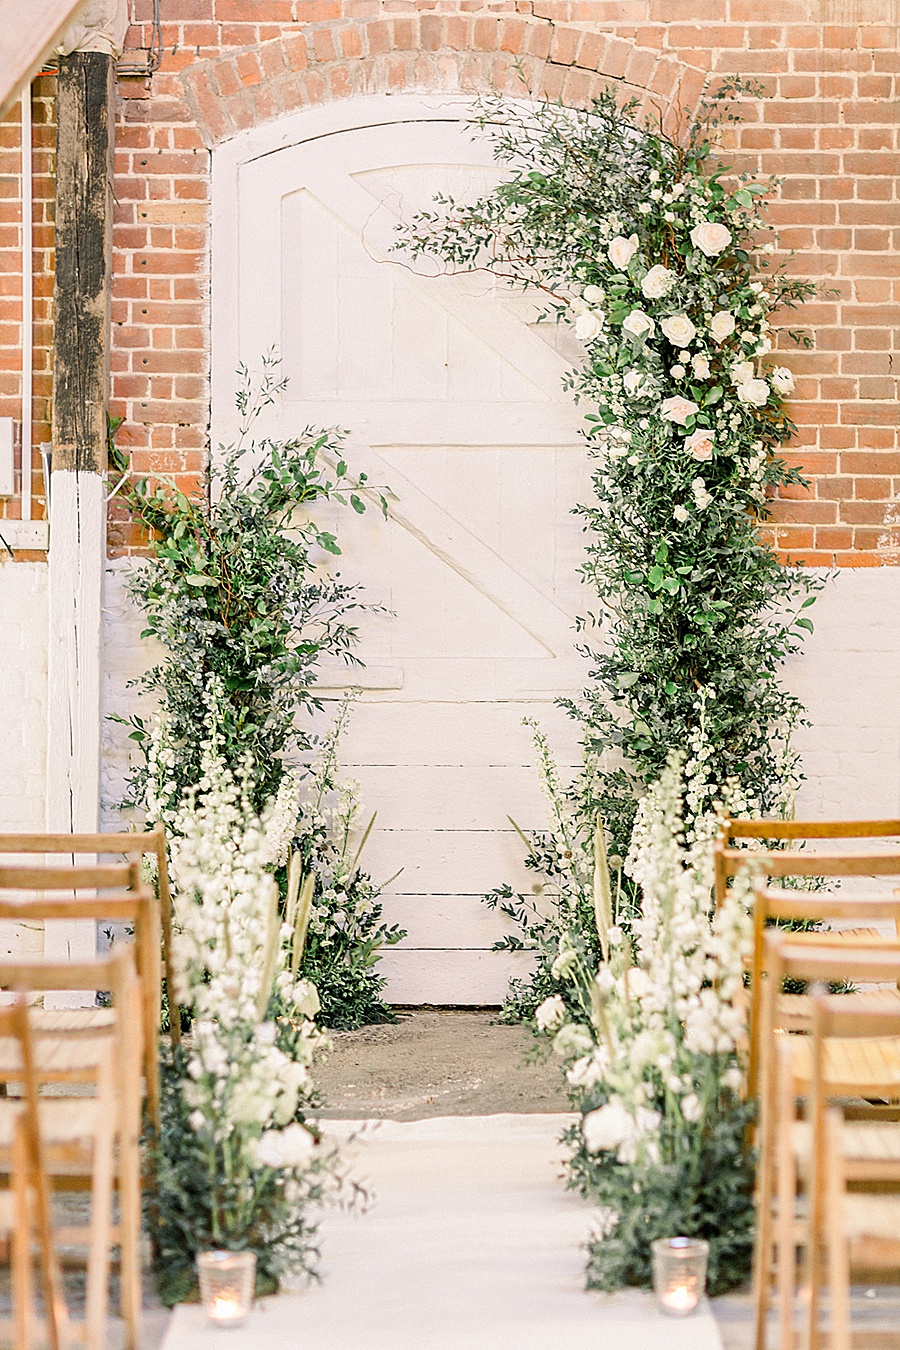 Barn venue transformed for a beautiful modern wedding, photo credit Terri and Lori (13)